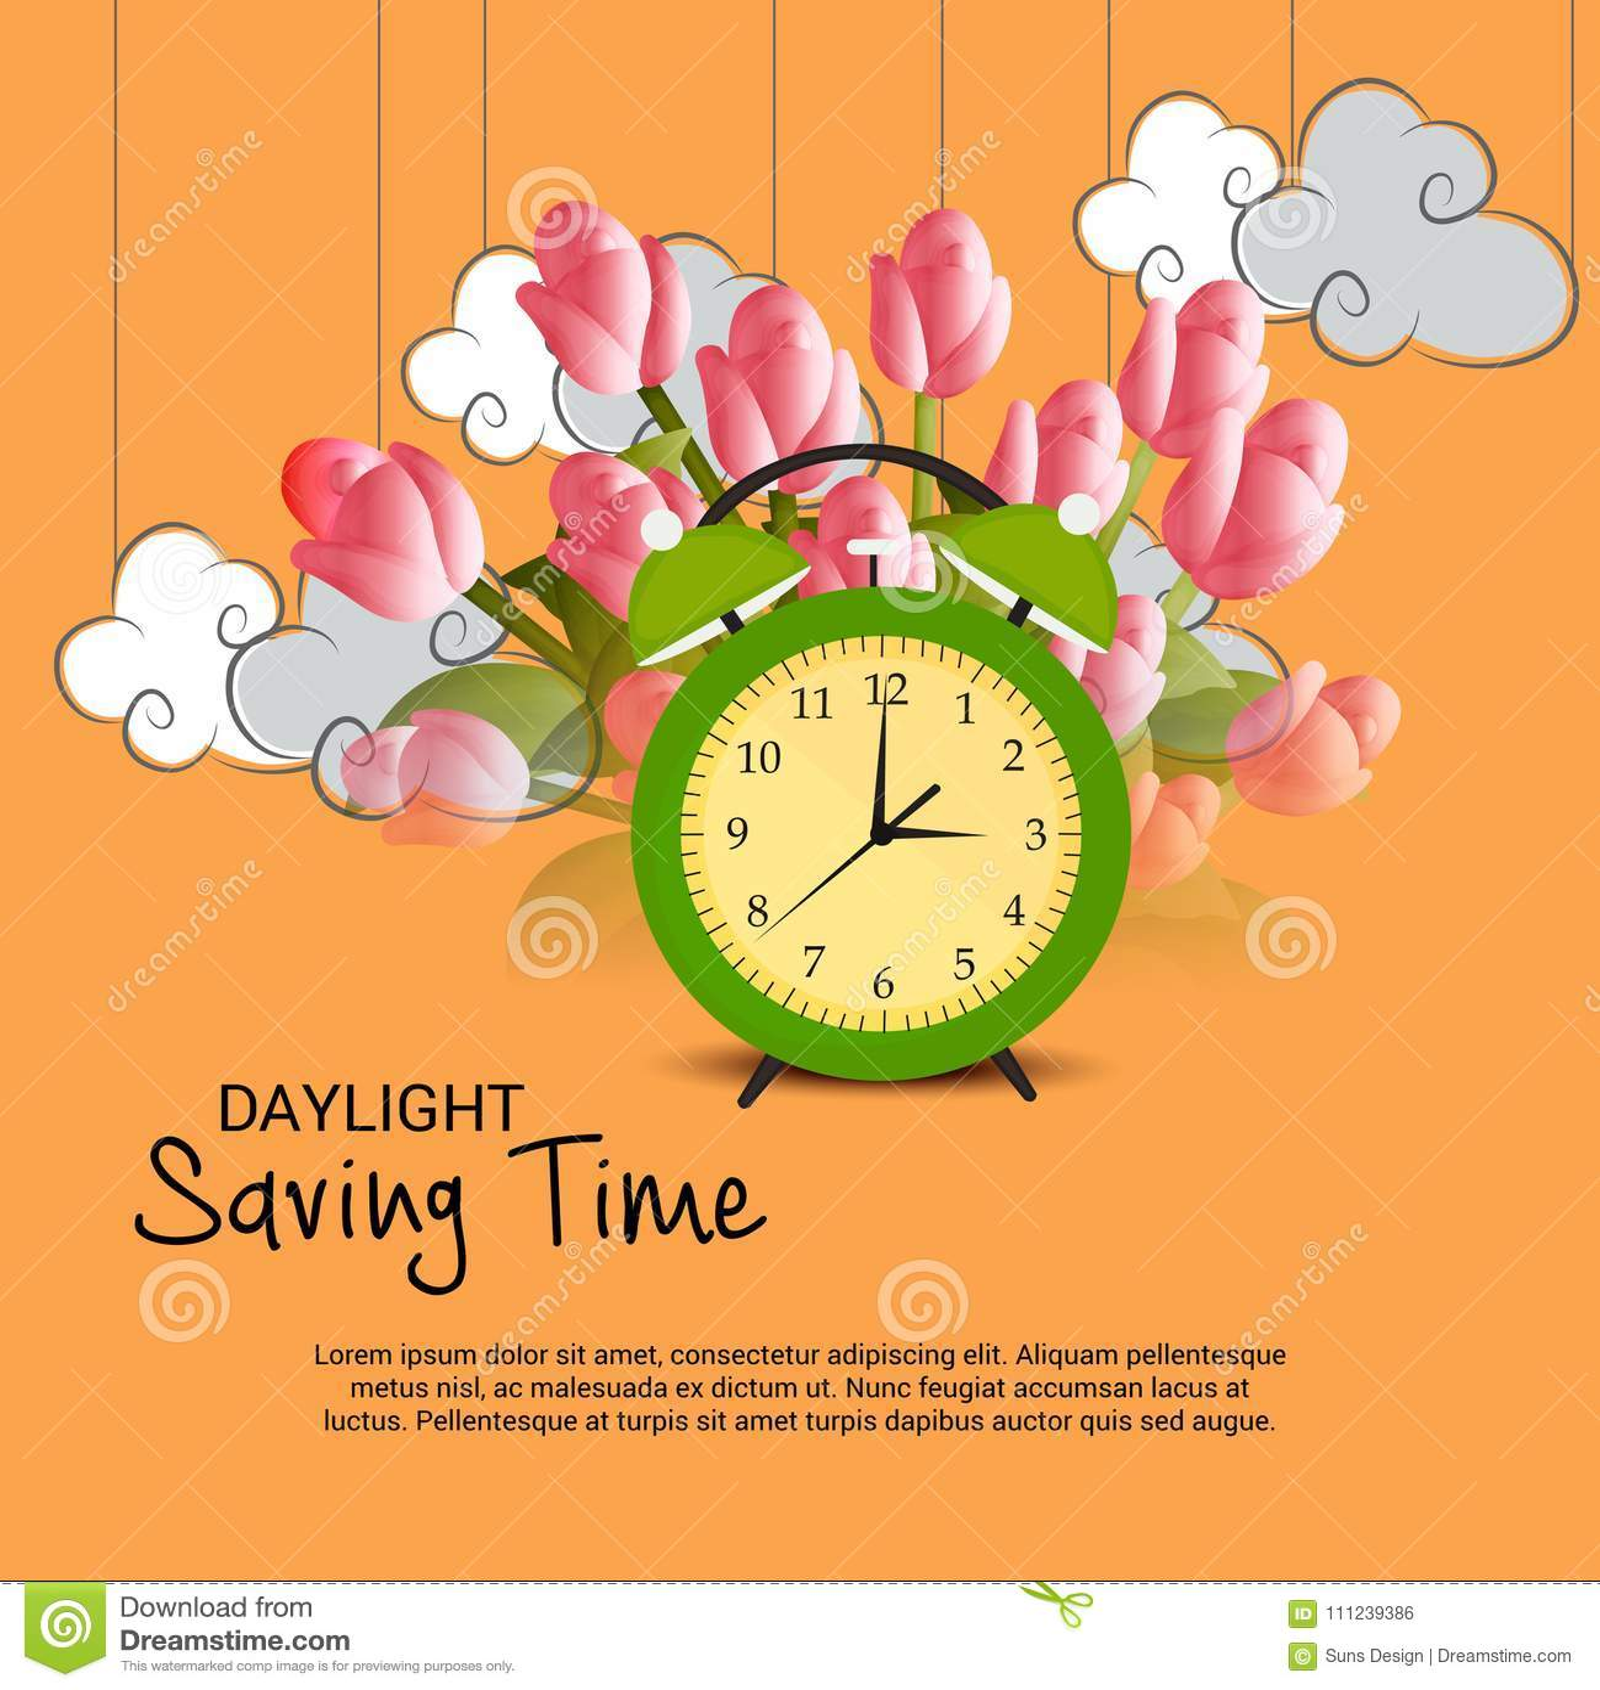 daylight saving time stock illustration illustration of flyer